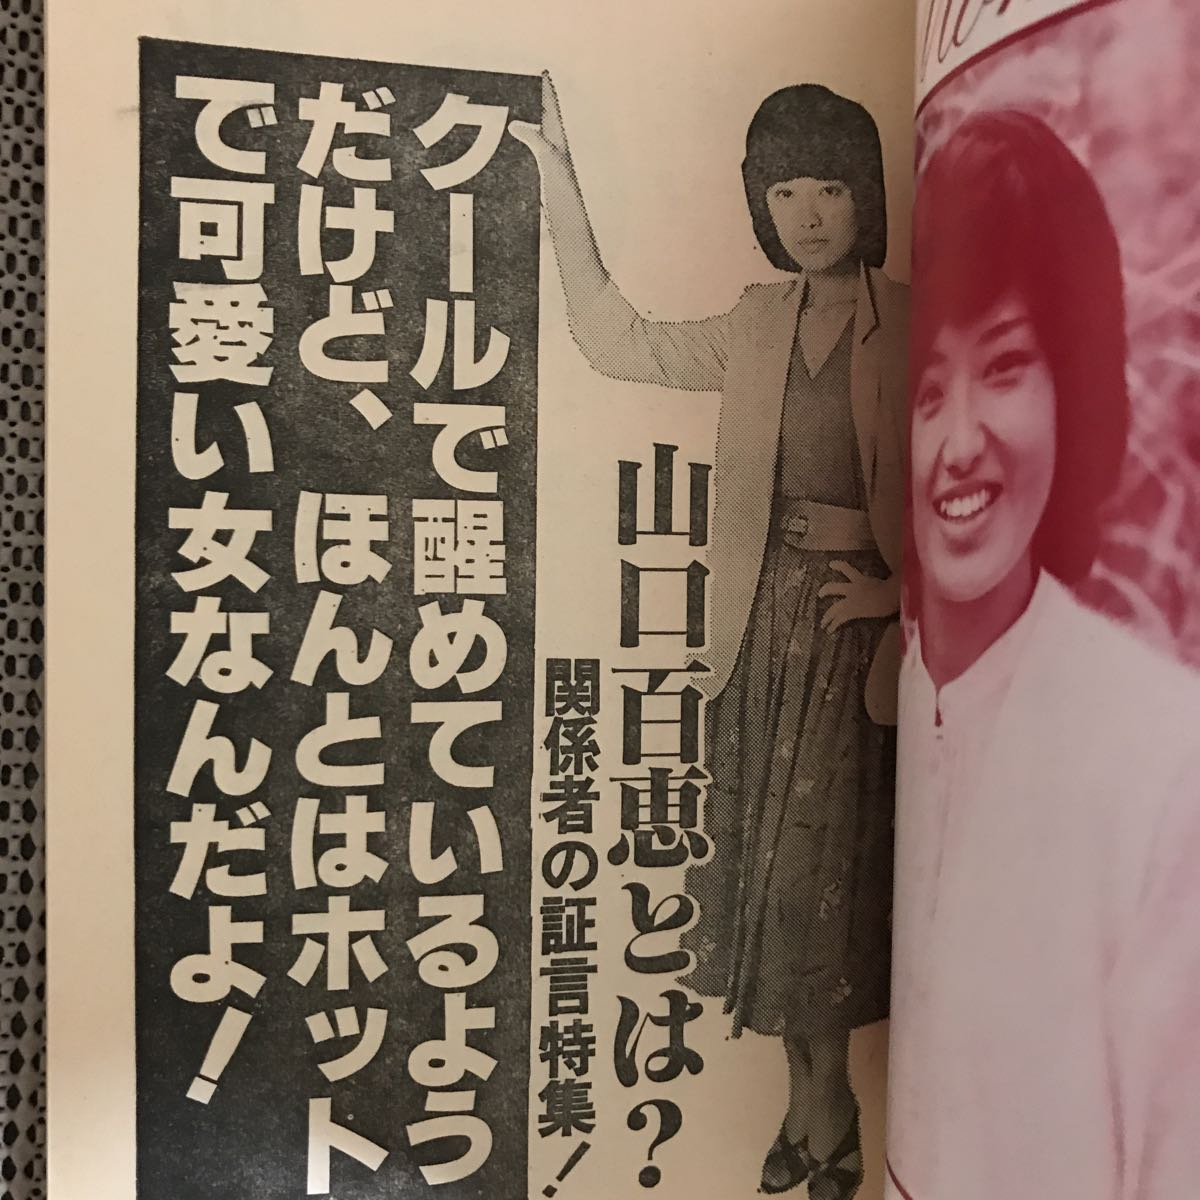 MOMOE 山口百恵・20歳の手帳 近代映画附録/昭和54年5月号 状態良好です_画像6